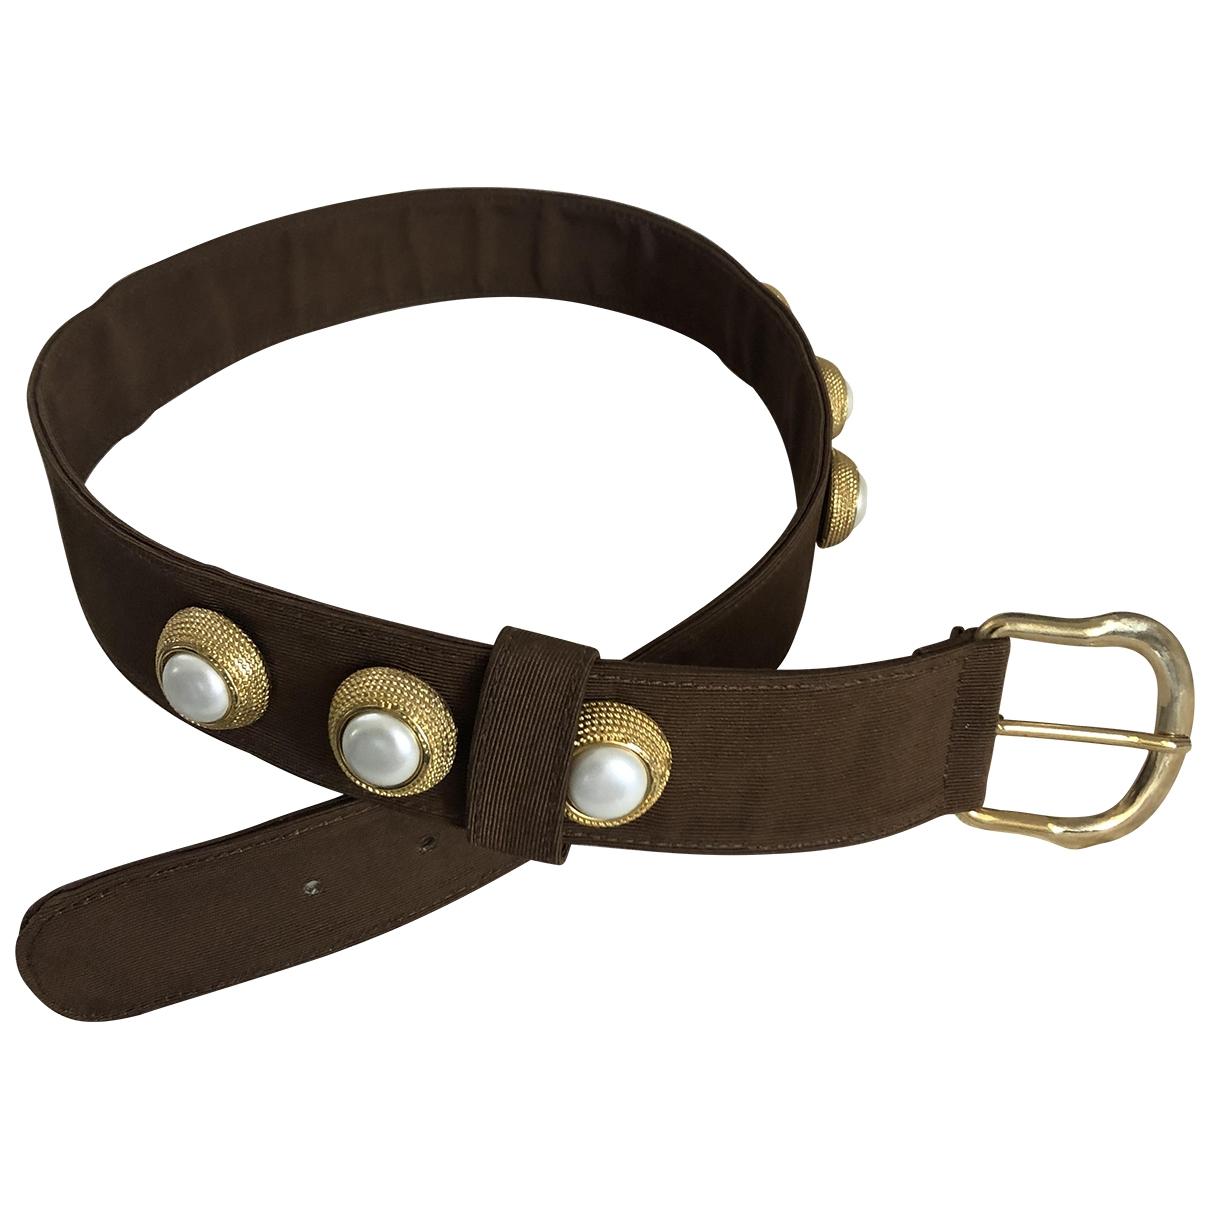 Cinturon de Lona Non Signe / Unsigned